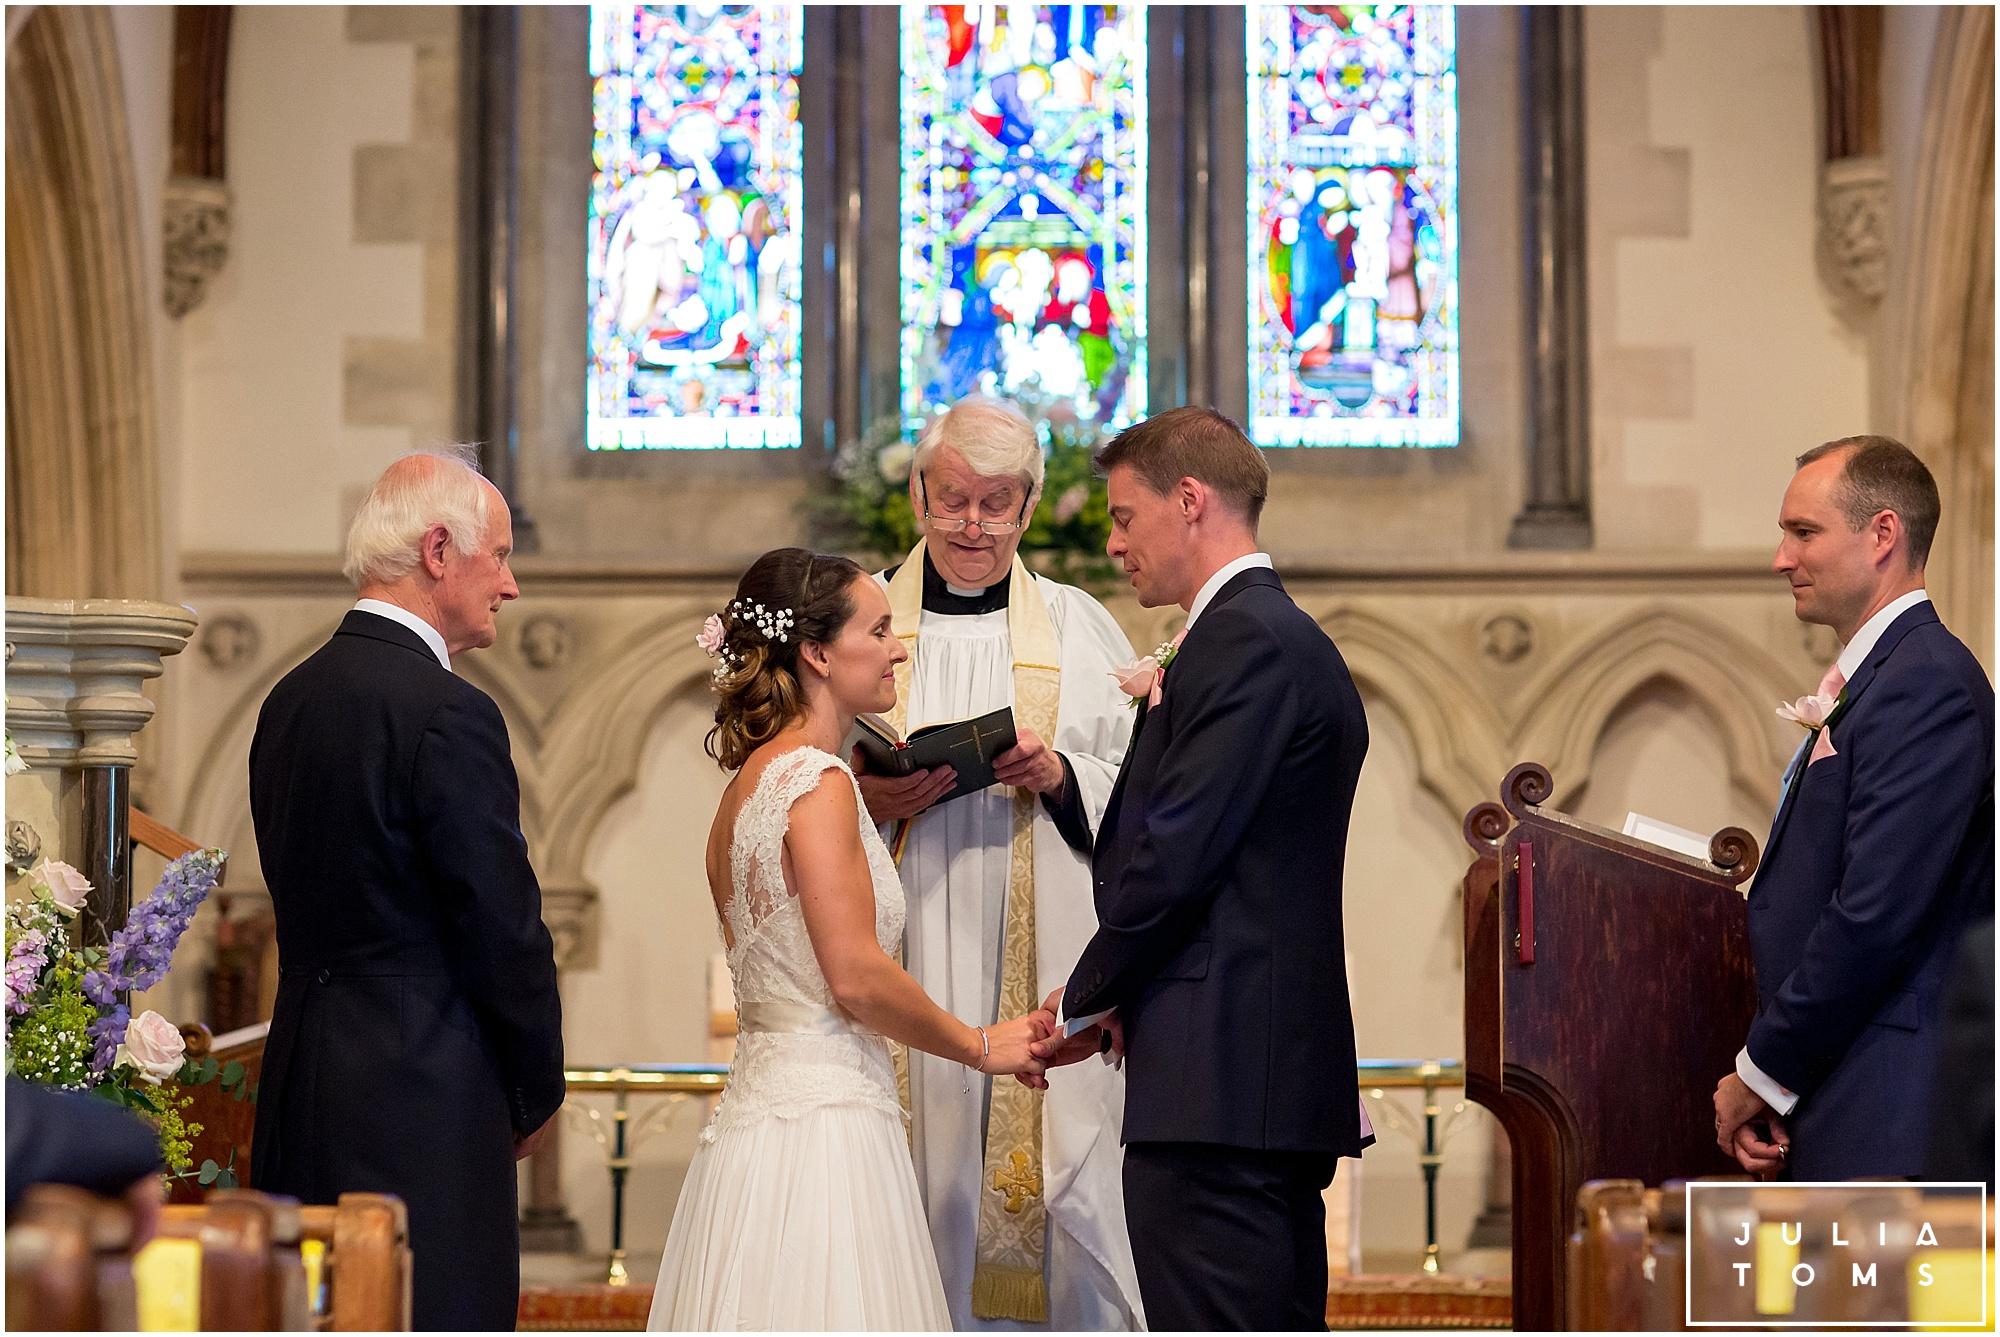 julia_toms_chichester_wedding_photographer_portsmouth_026.jpg